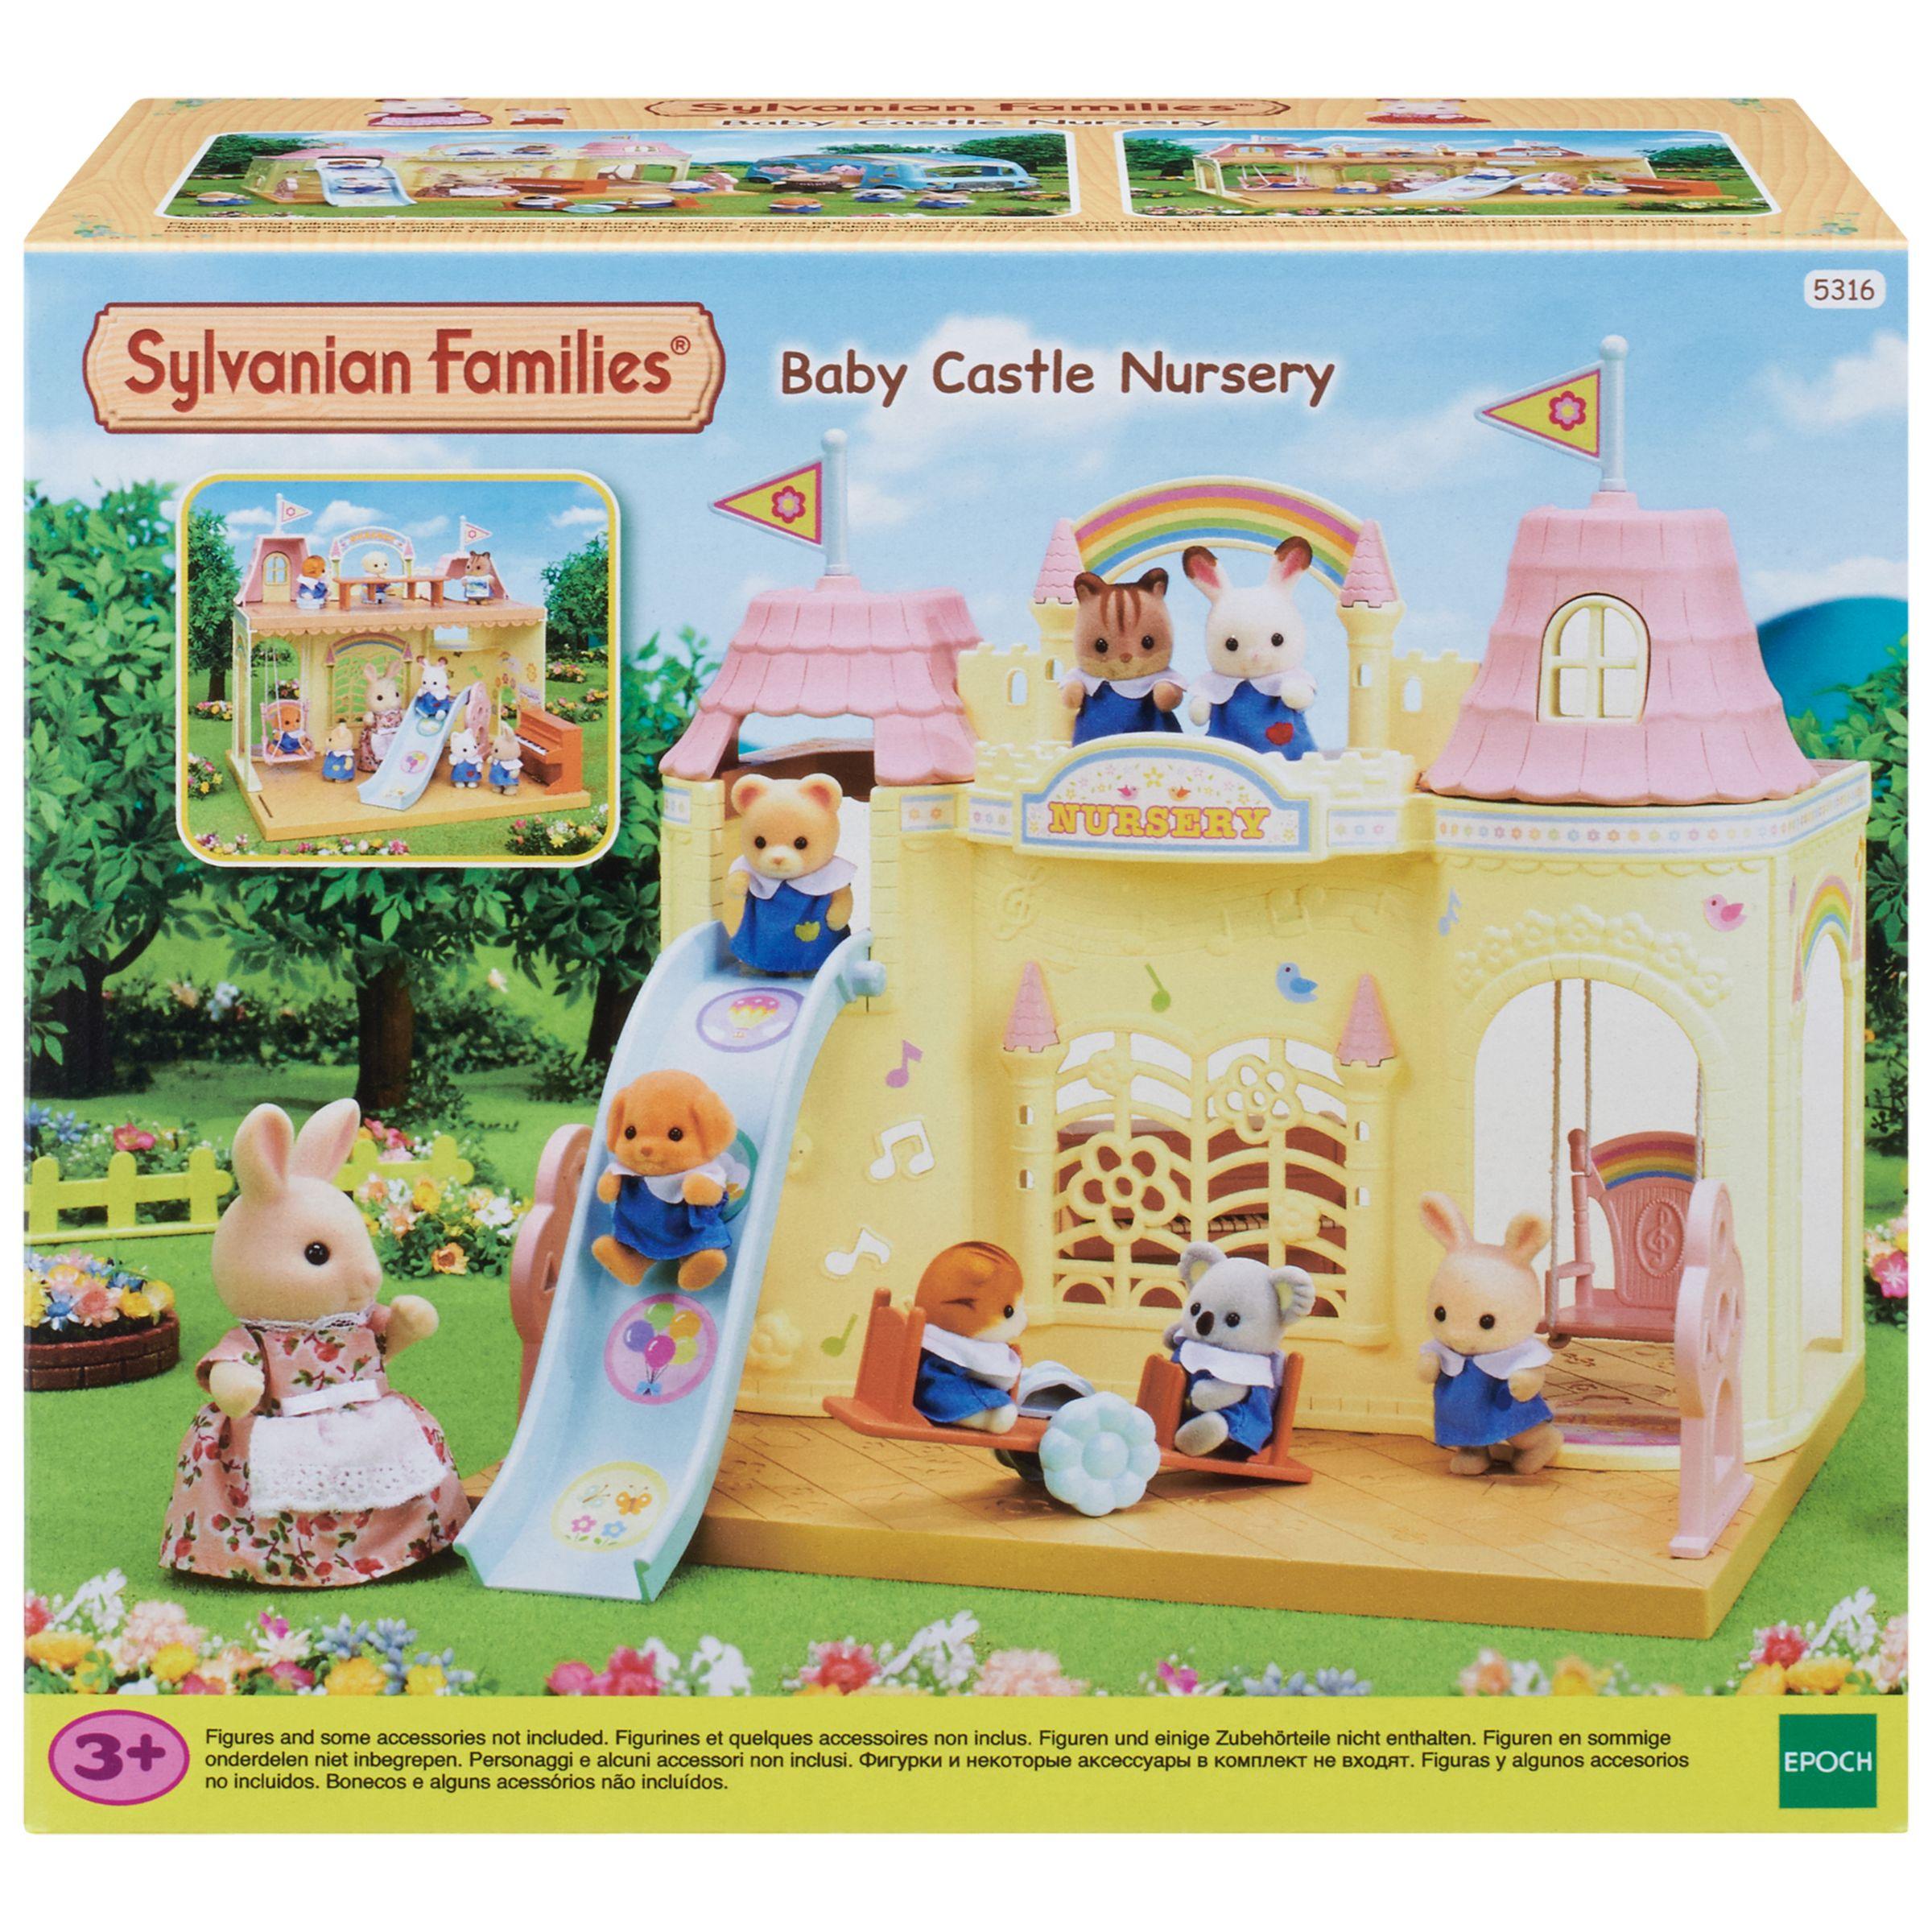 Sylvanian Families Sylvanian Families Baby Castle Nursery